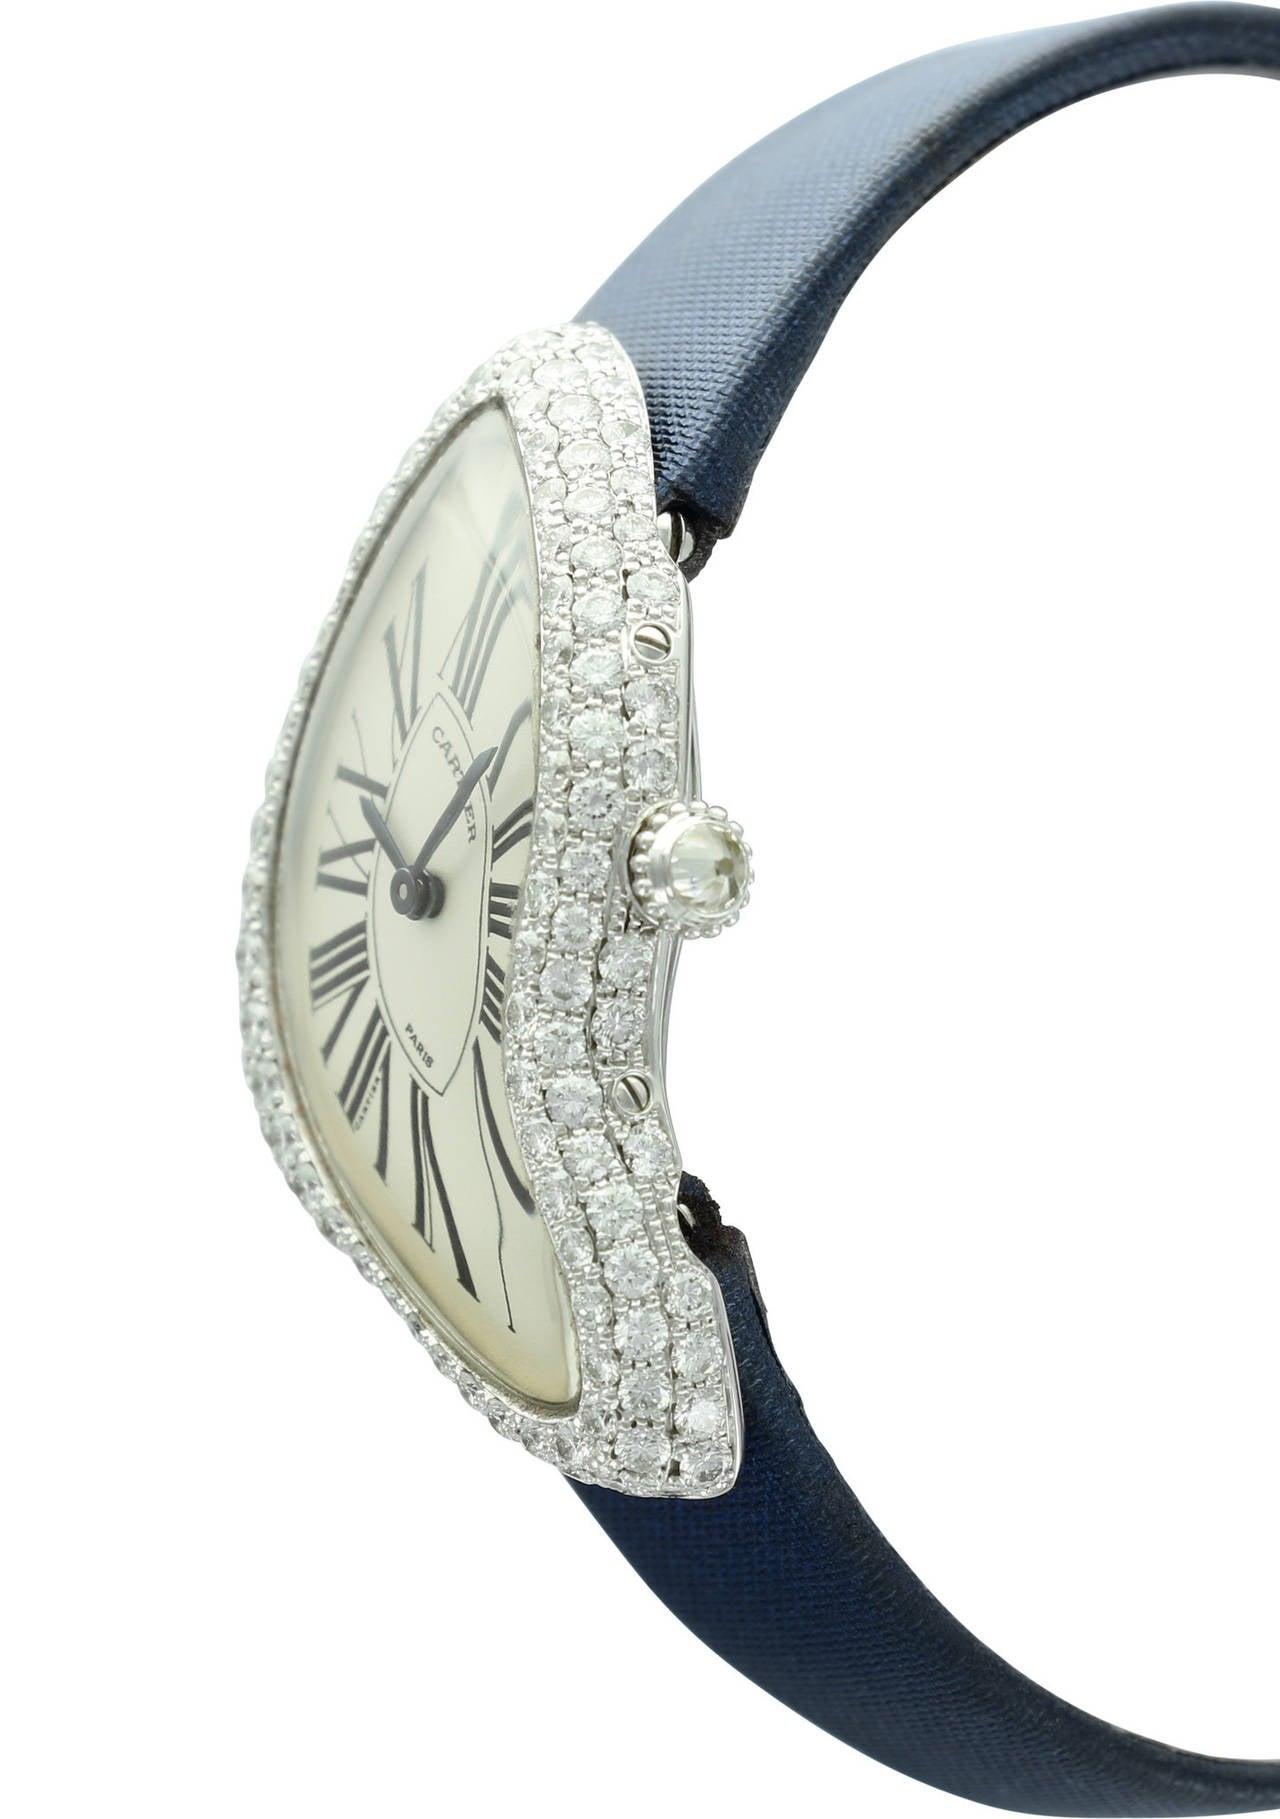 Cartier White Gold Crash Diamond Bezel Wristwatch 3